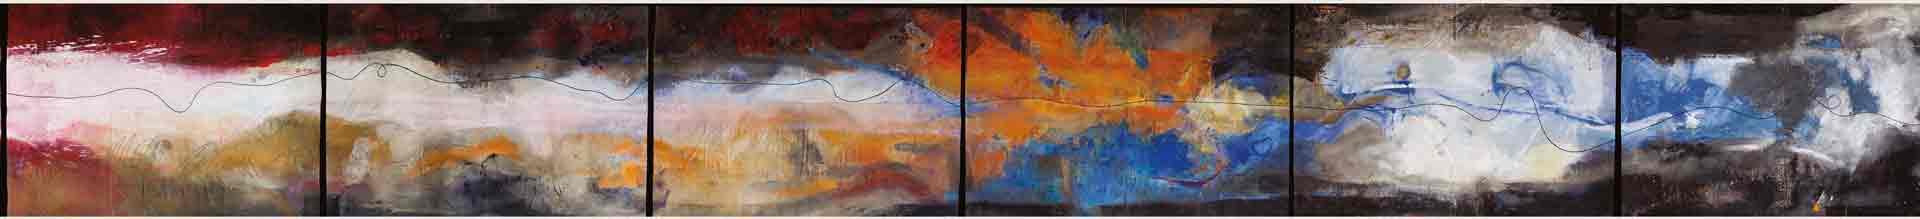 Dalva Duarte 24 Caprices - Abstract strip 05